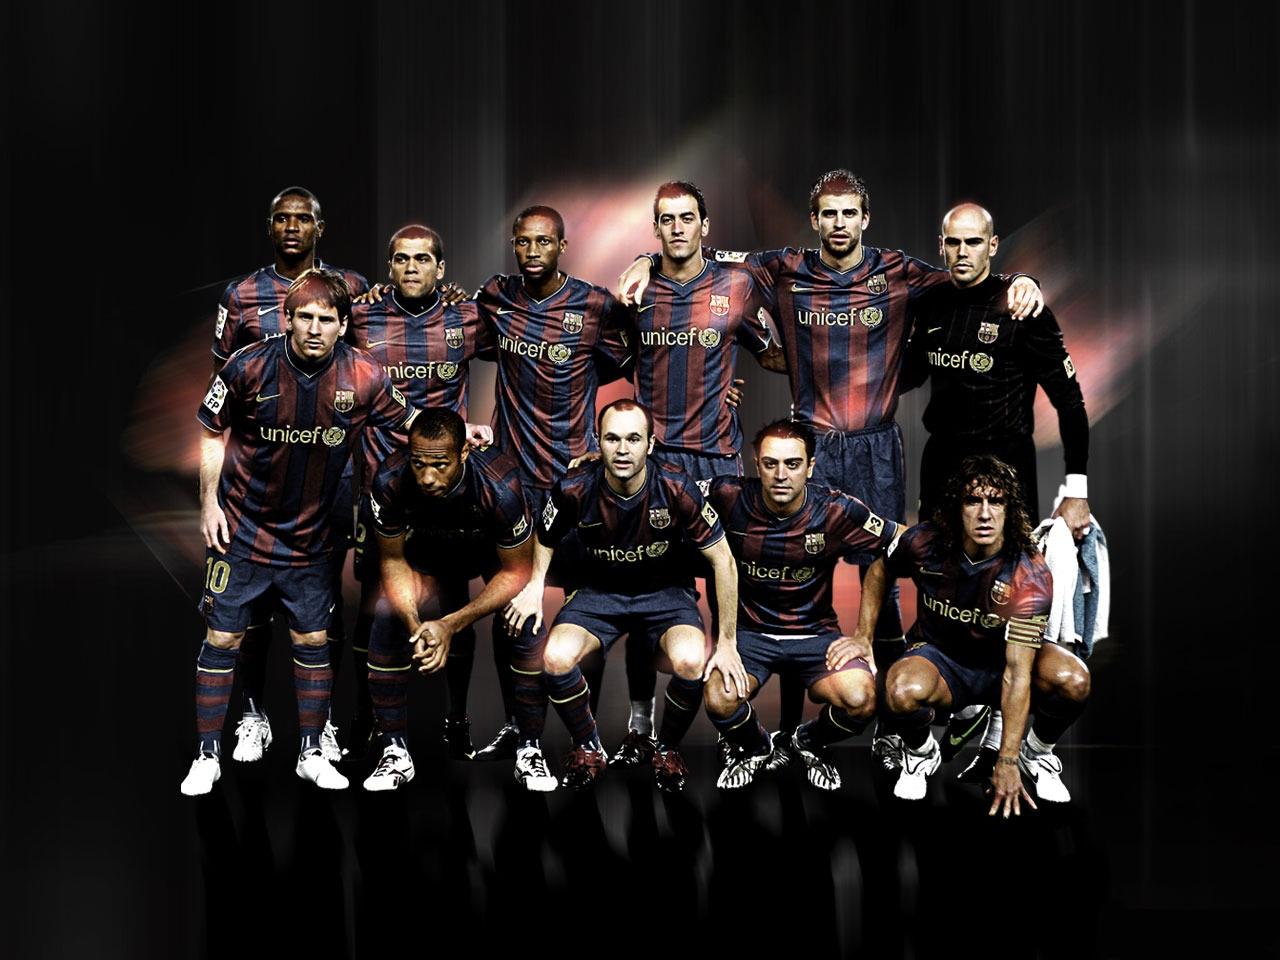 Sport Wallpaper Fc Barcelona: All Wallpapers: FC Barcelona Team Cool HD Wallpapers 2013